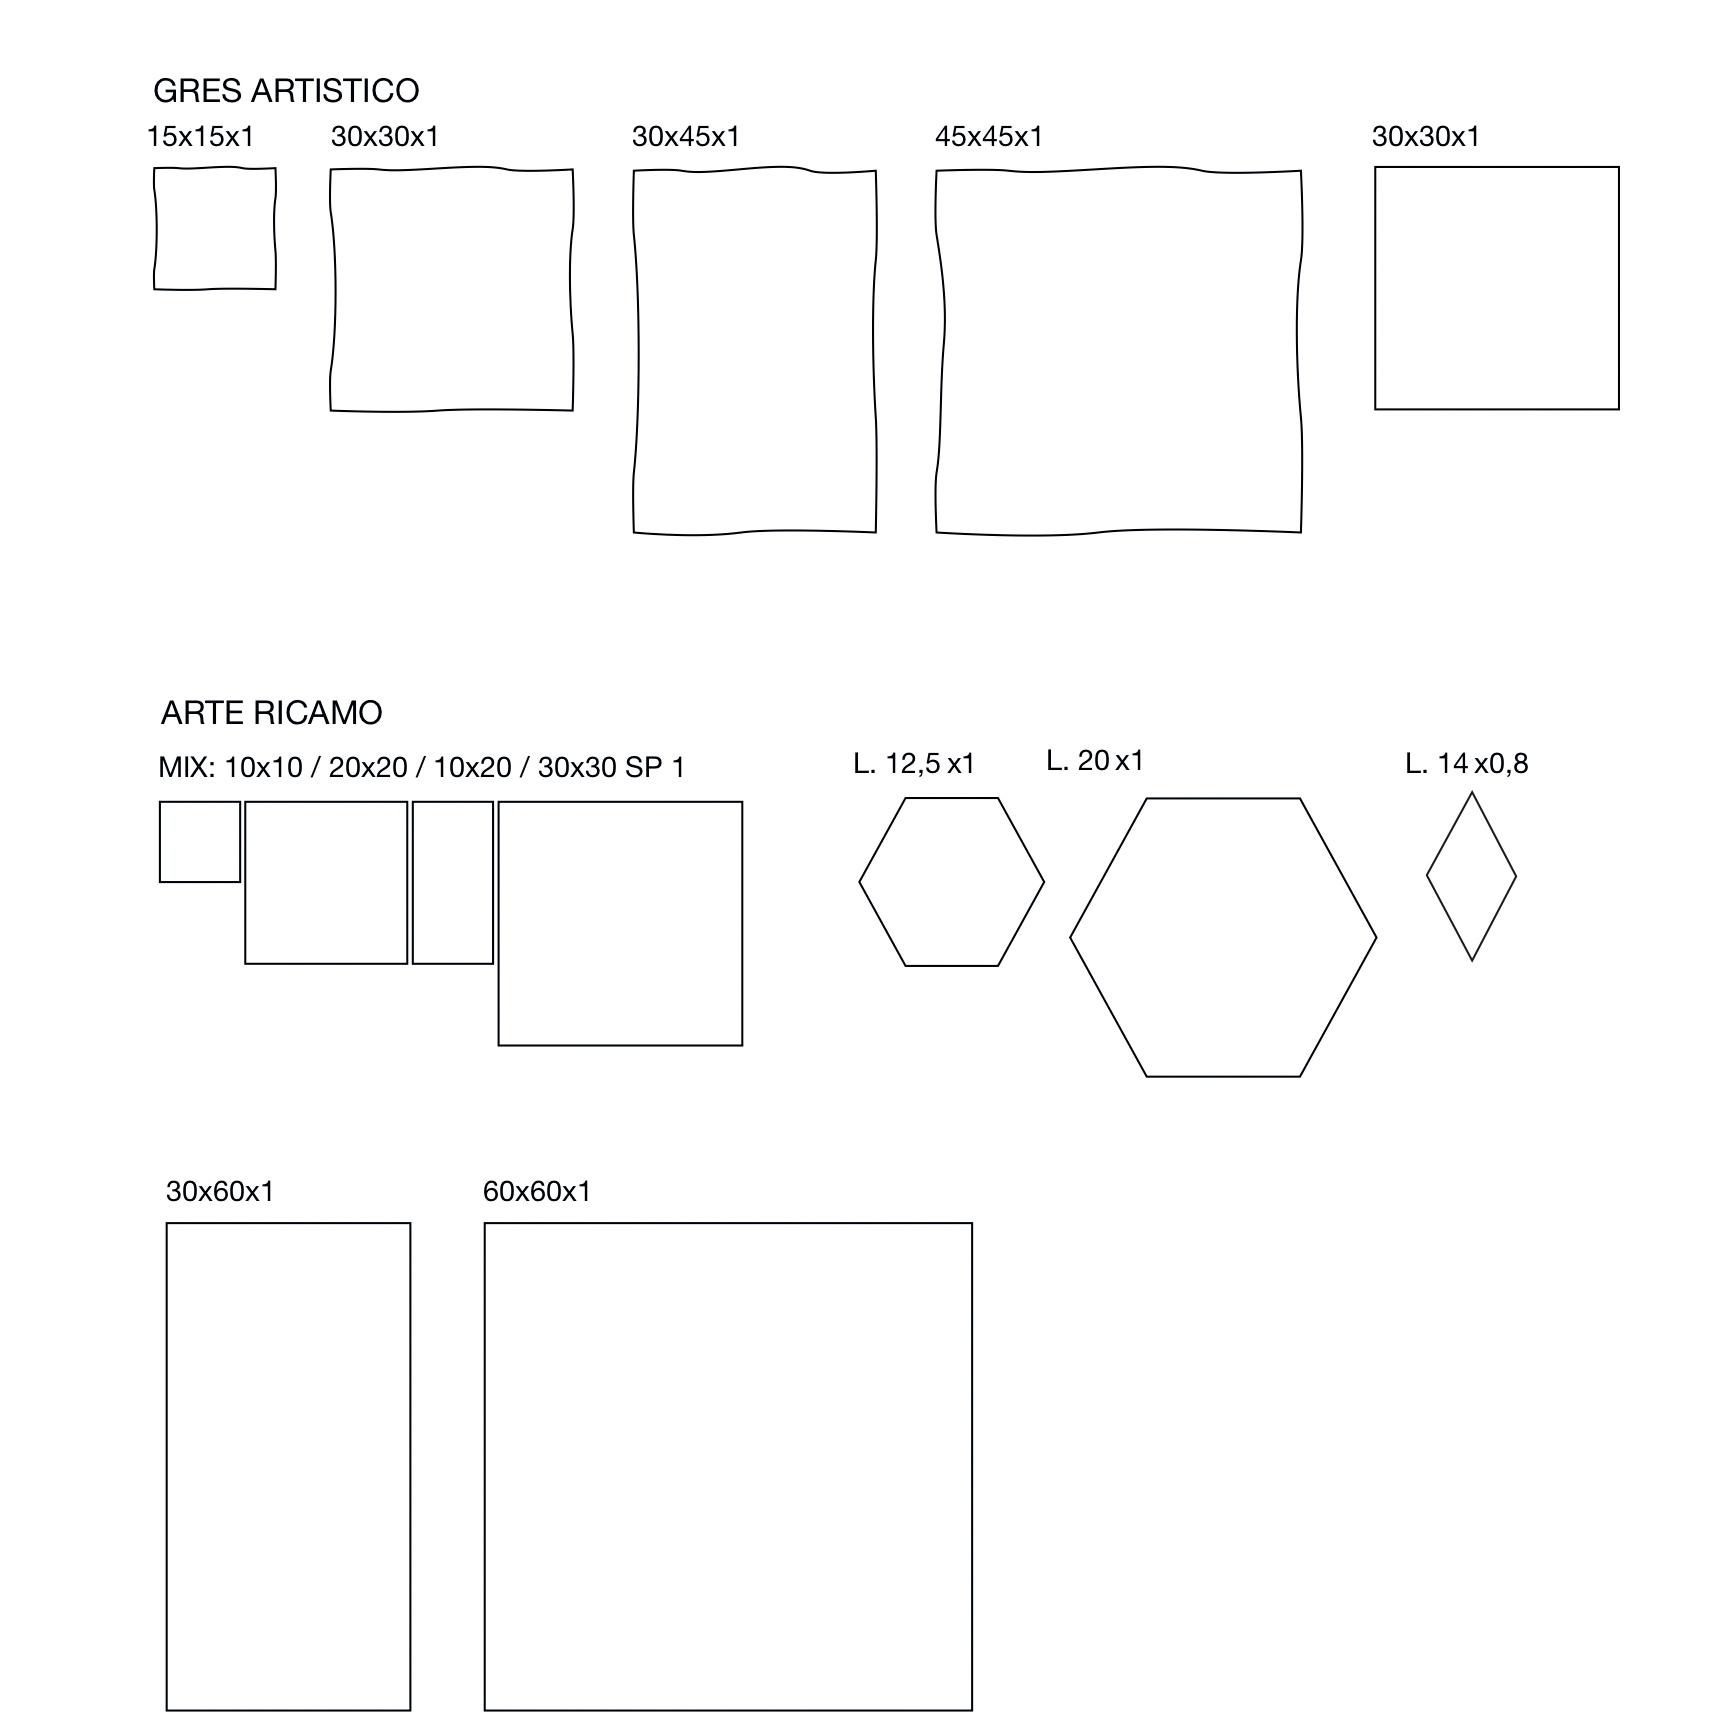 Parallelogram Artistic Gres